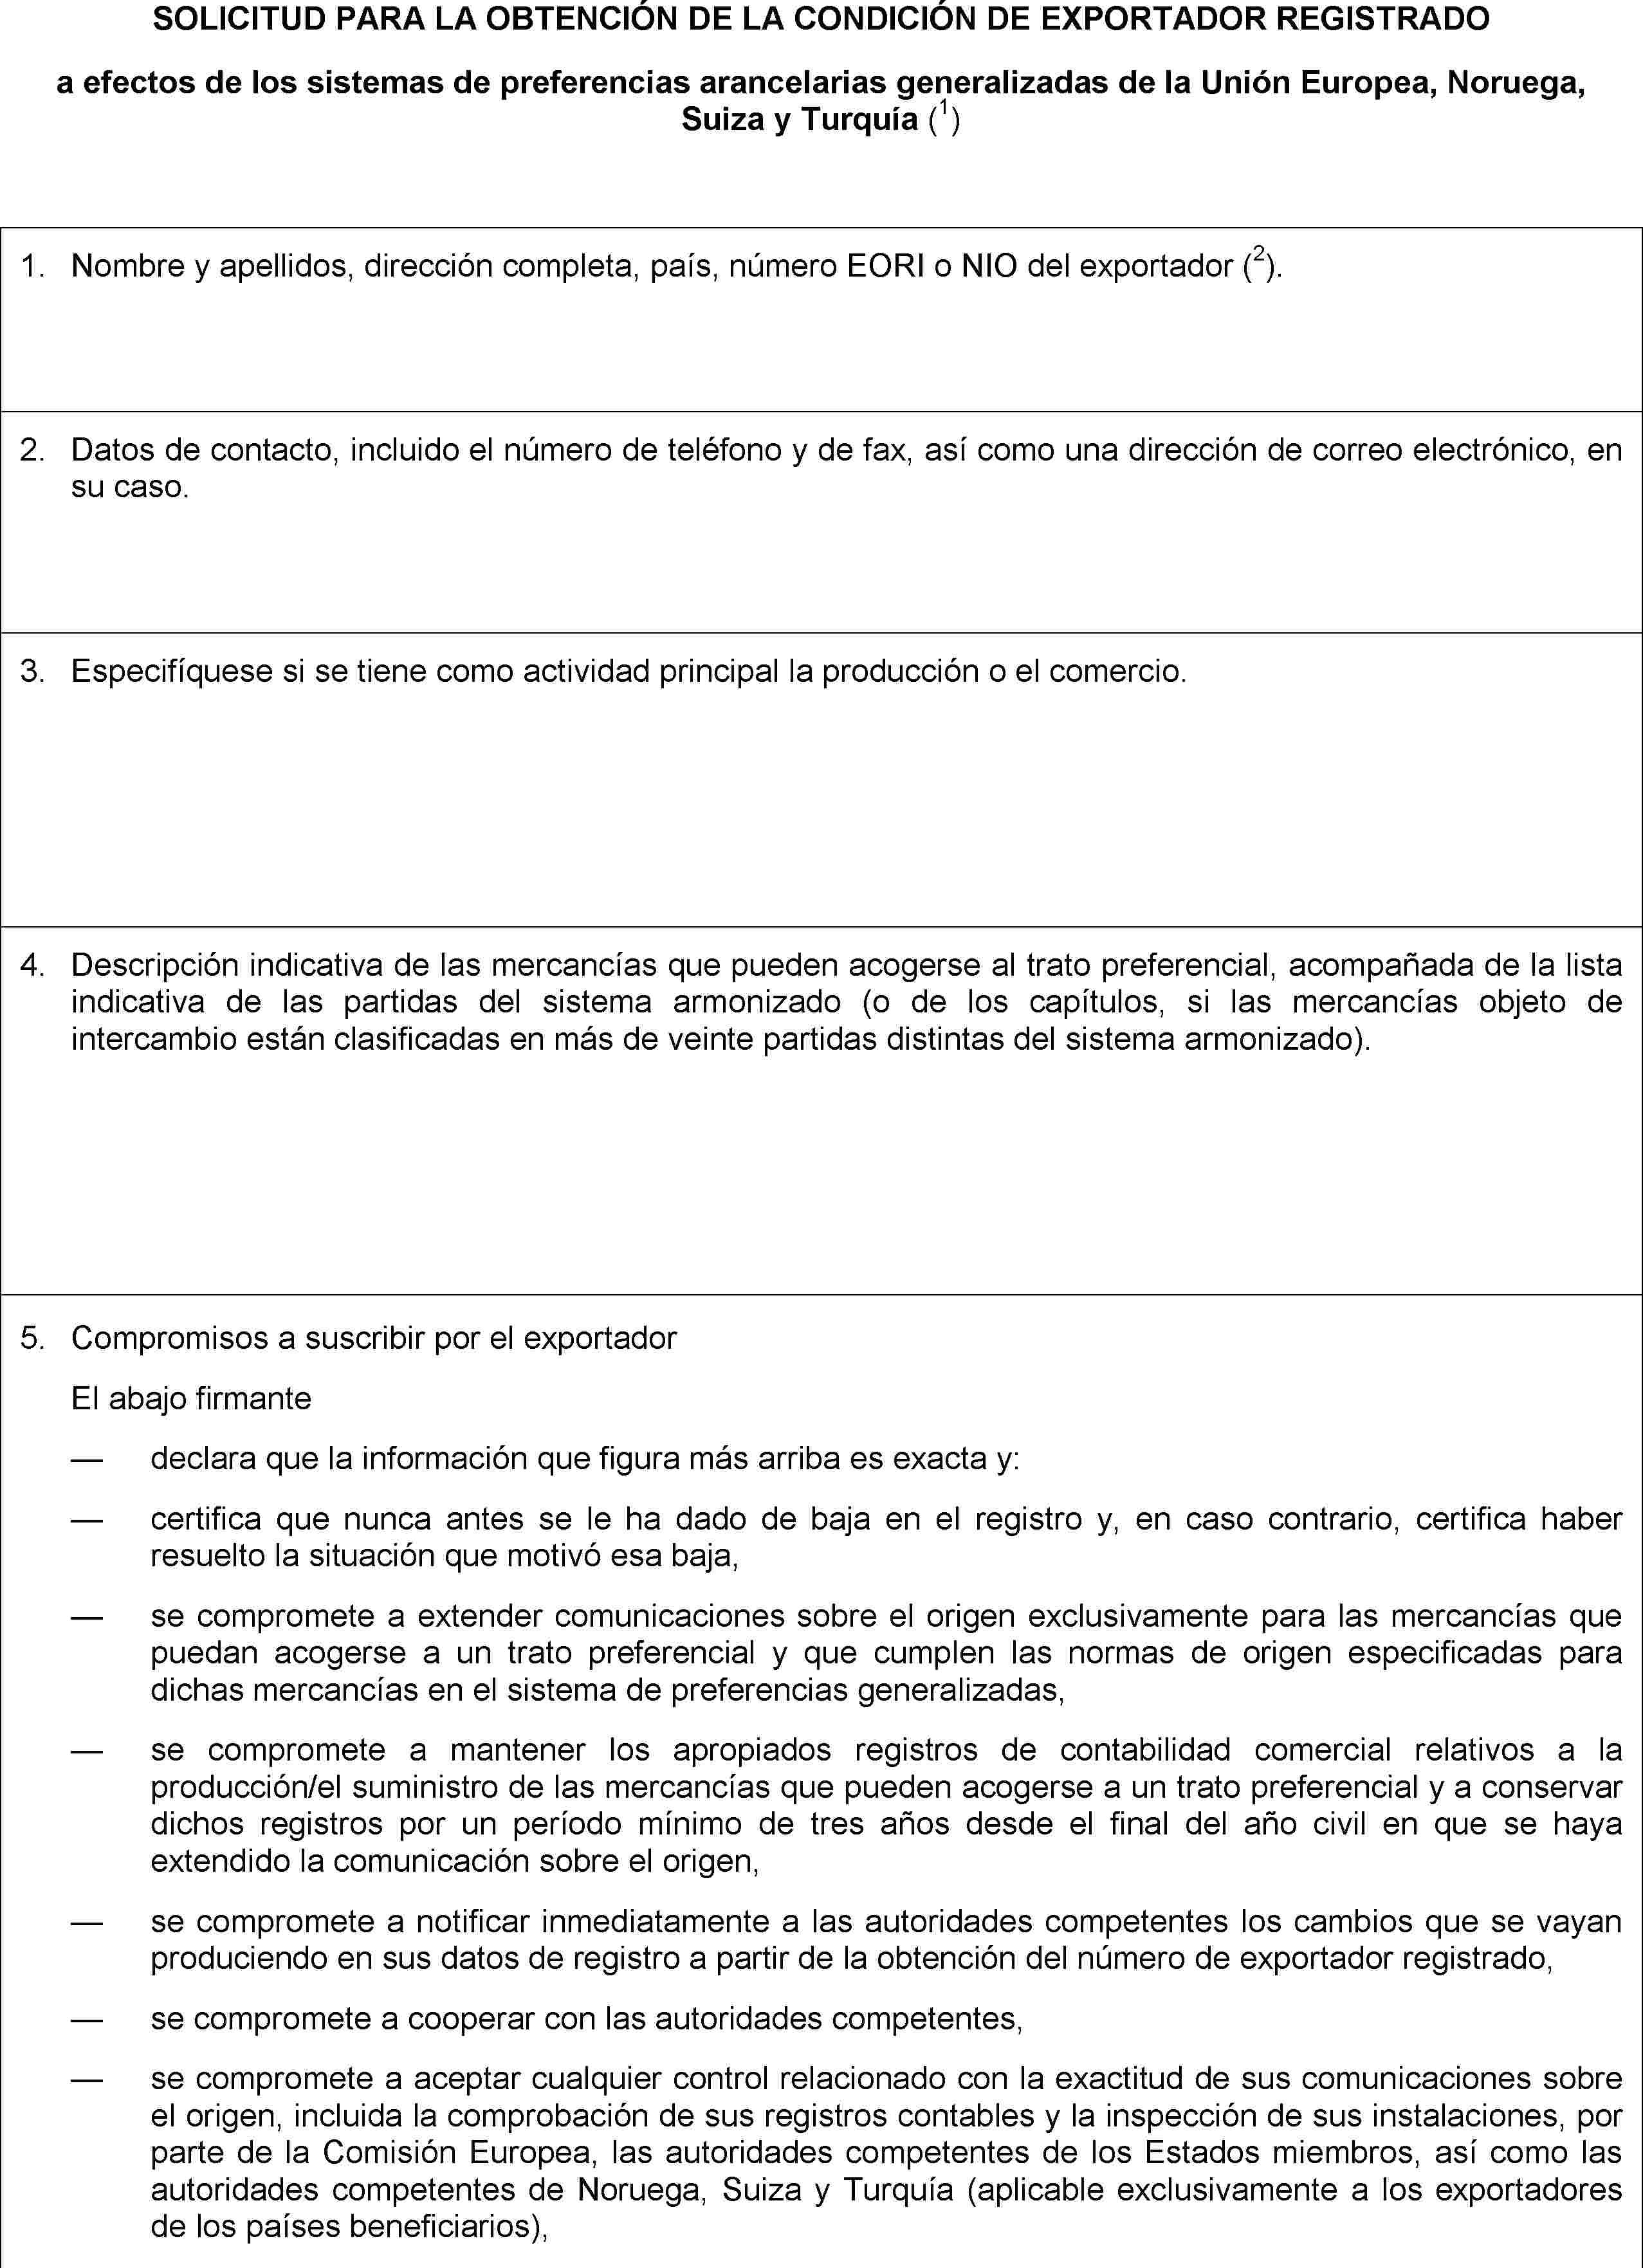 Calendario Abril 2019 Para Imprimir Argentina Recientes Eur Lex R2454 En Eur Lex